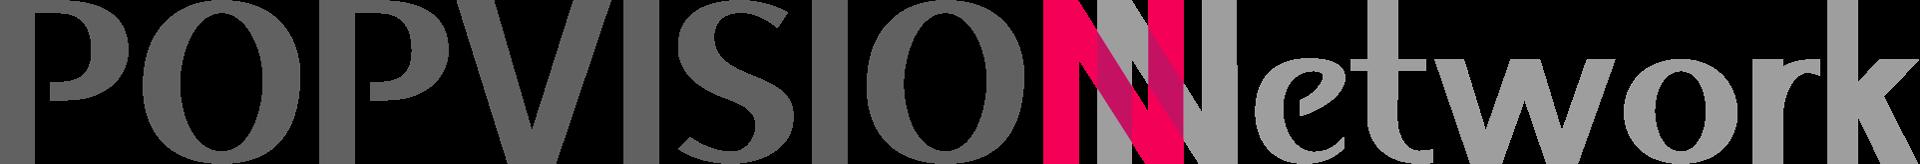 POPVISION Network